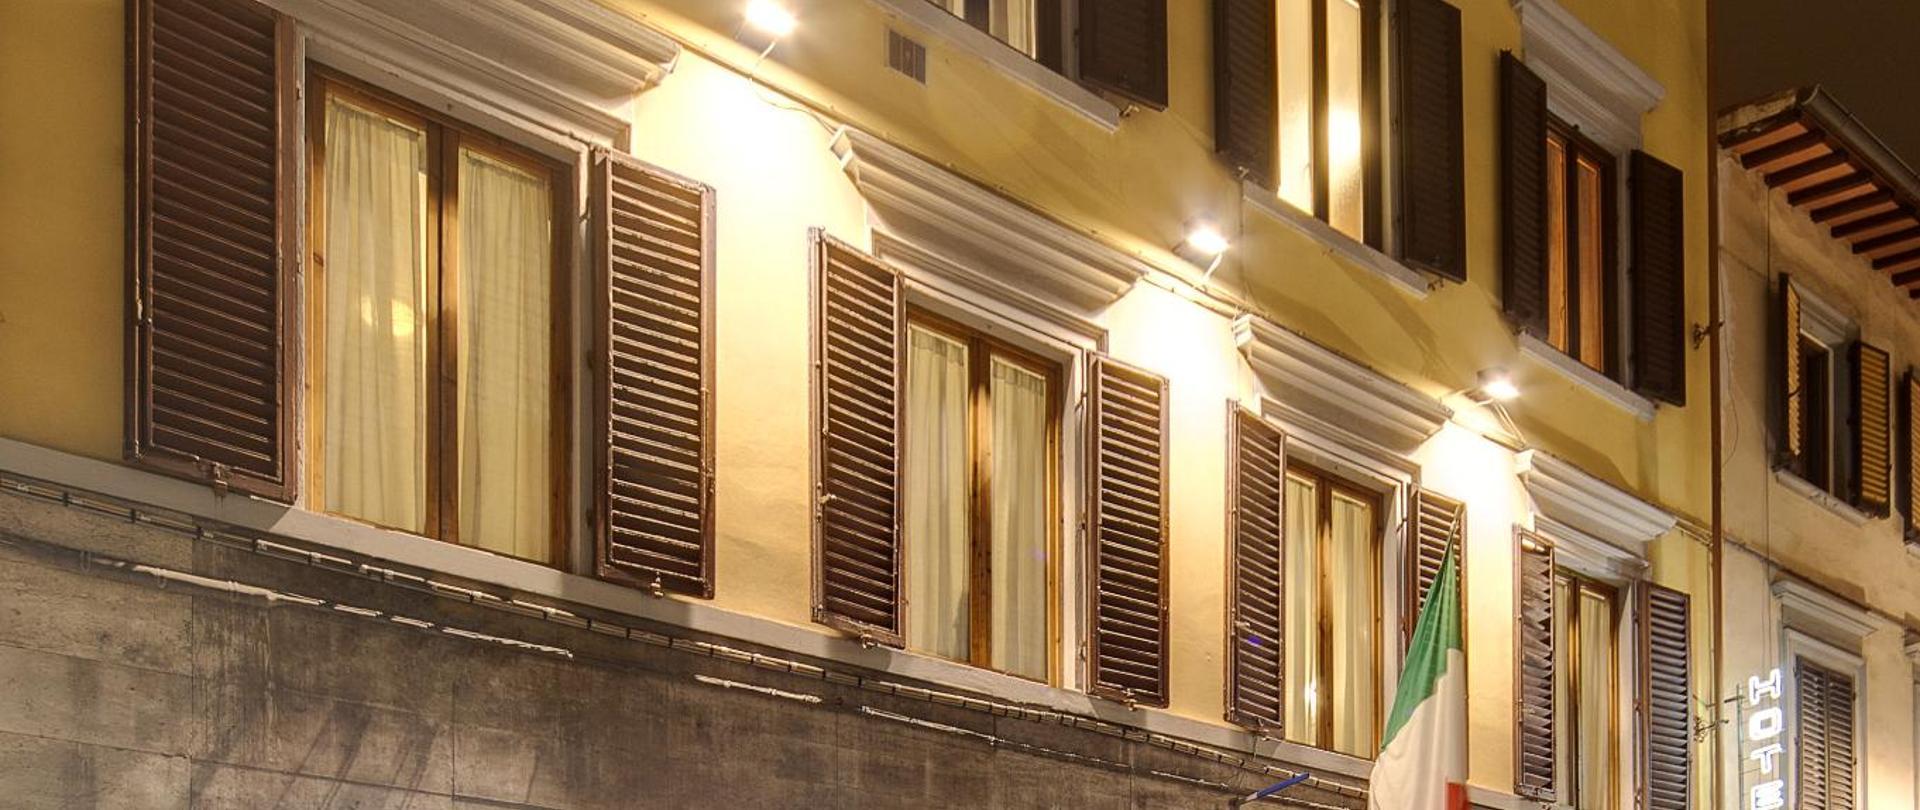 Hotel Guelfa